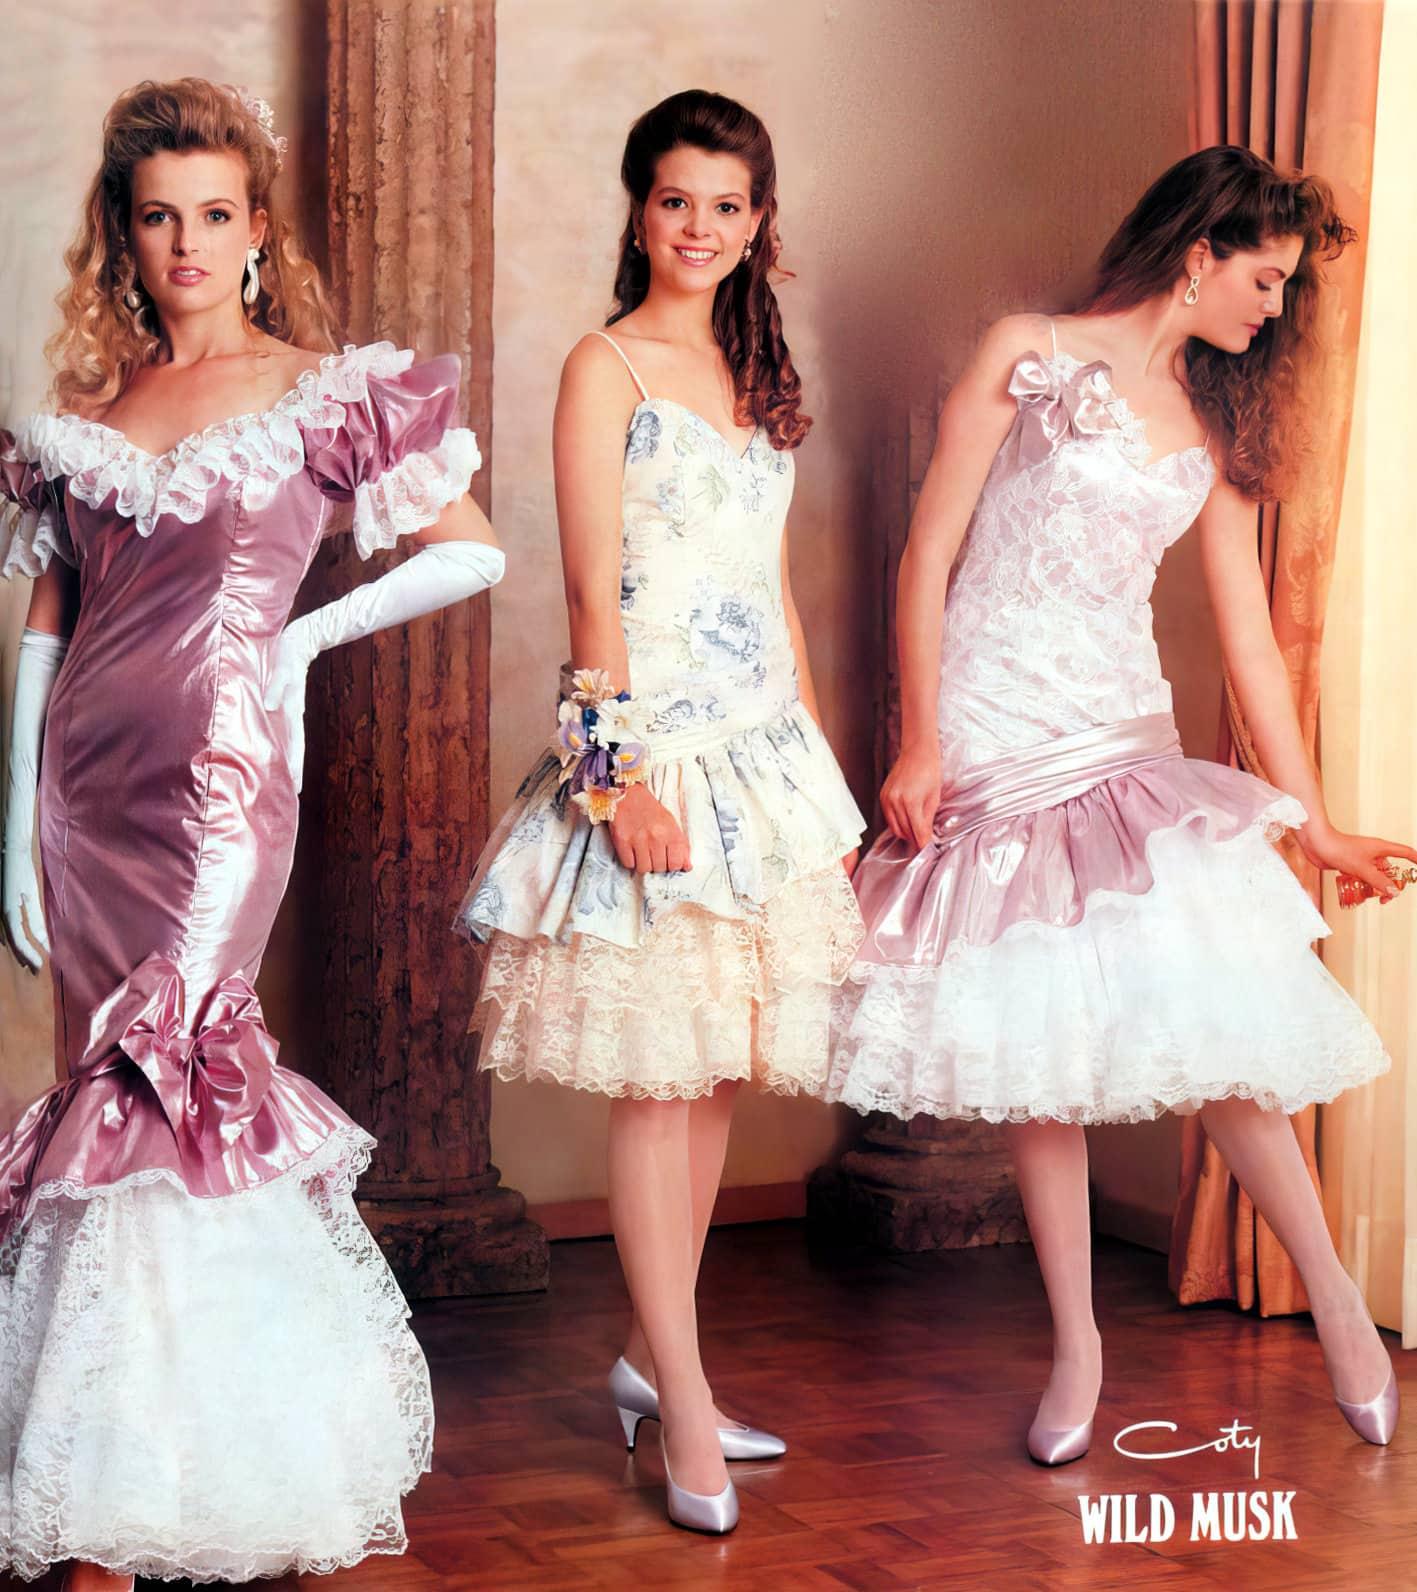 1980s prom dresses - Coty